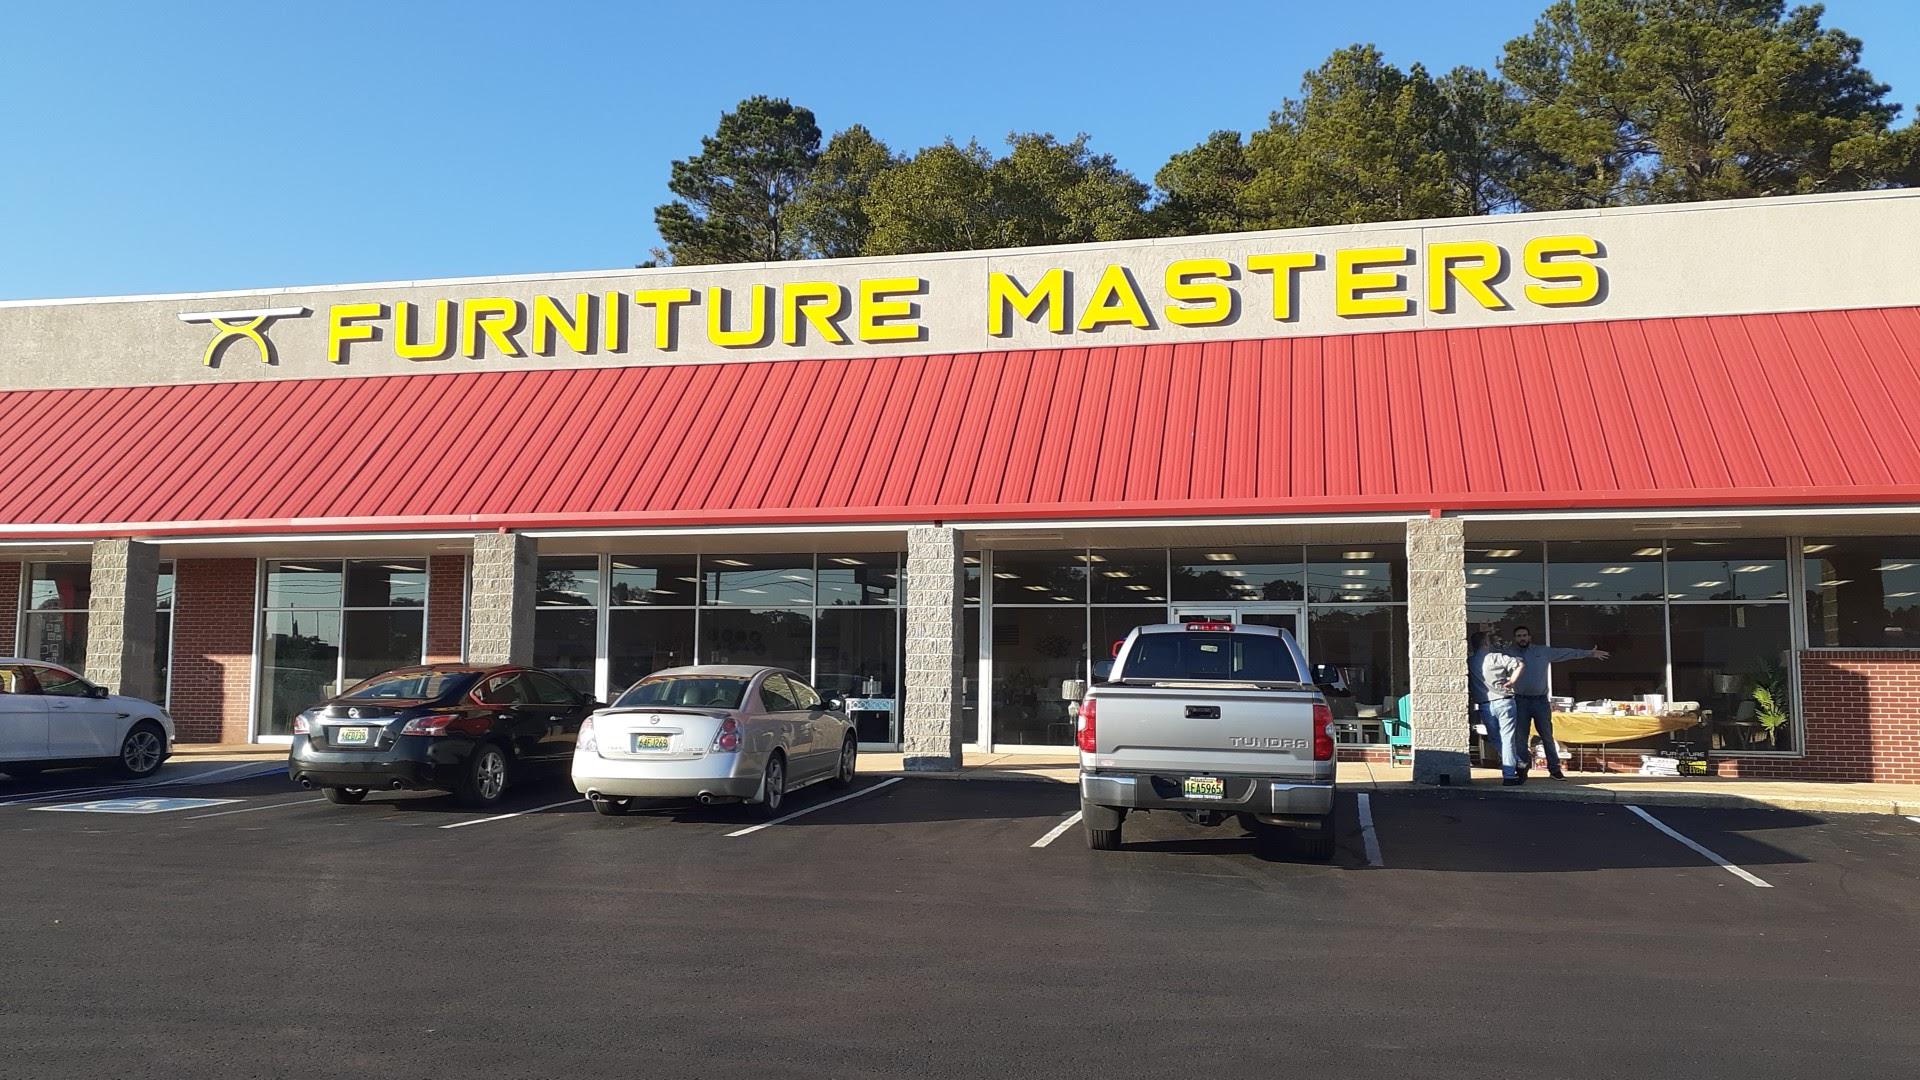 Furniture Masters 724 Hwy 78 W, Jasper